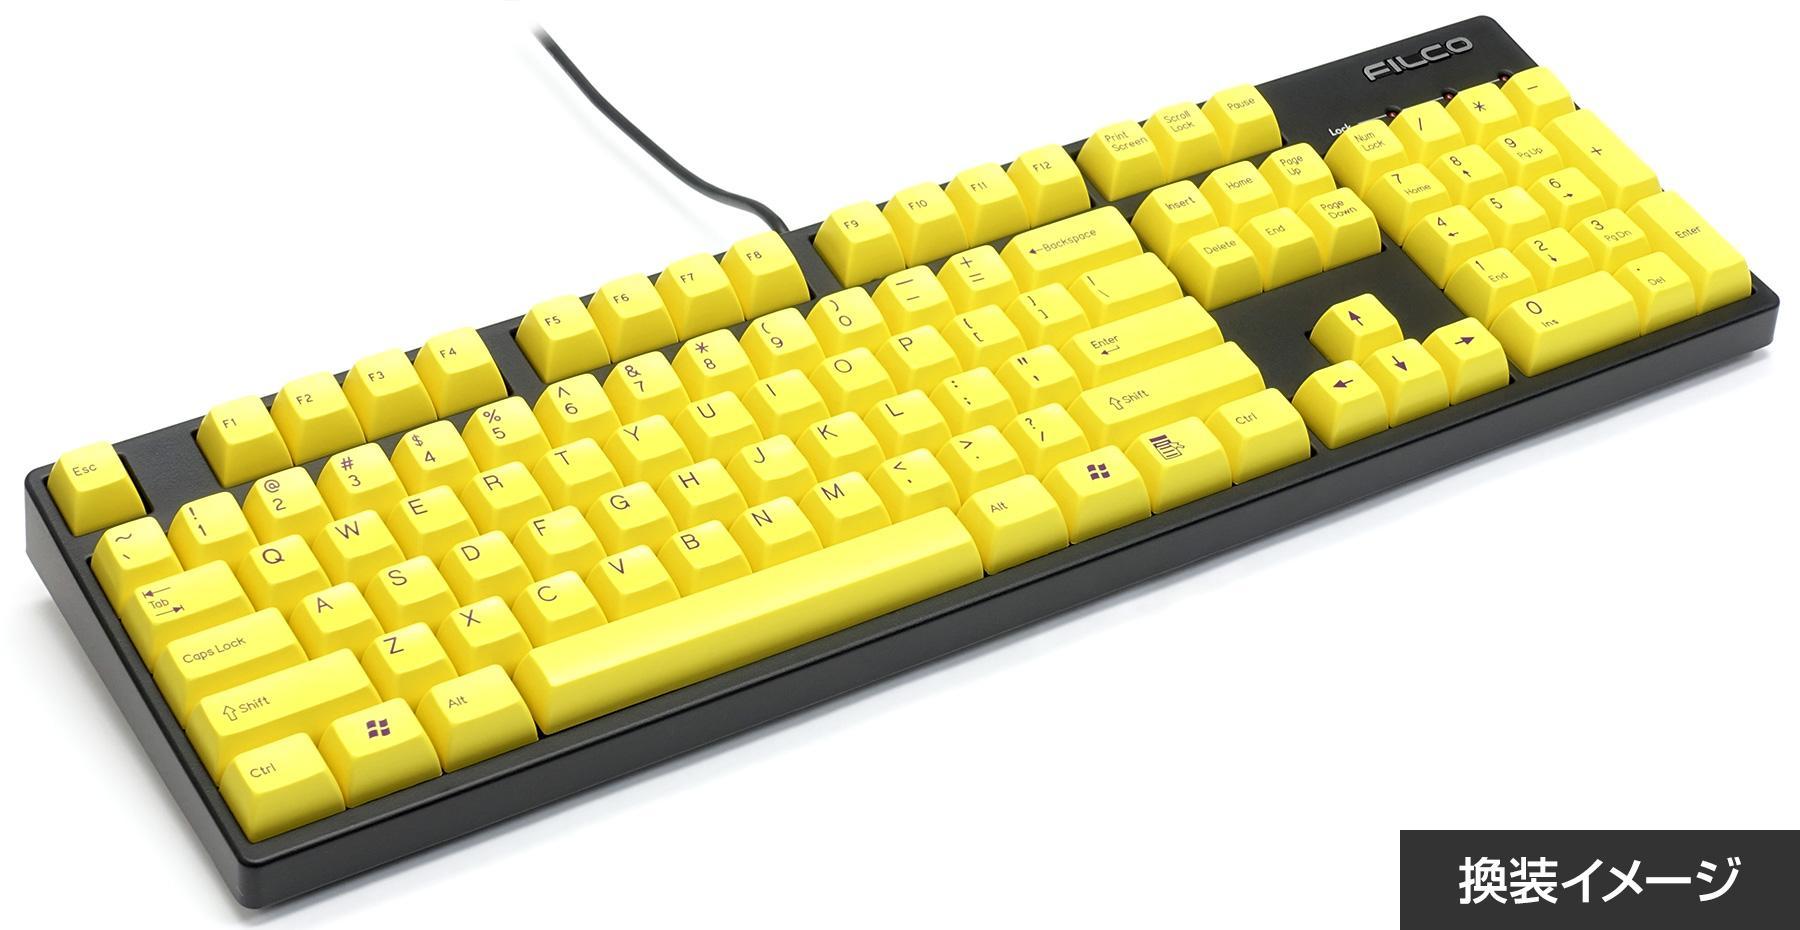 Double Shot 104-Key Keycap Set - Yellow (Filco)